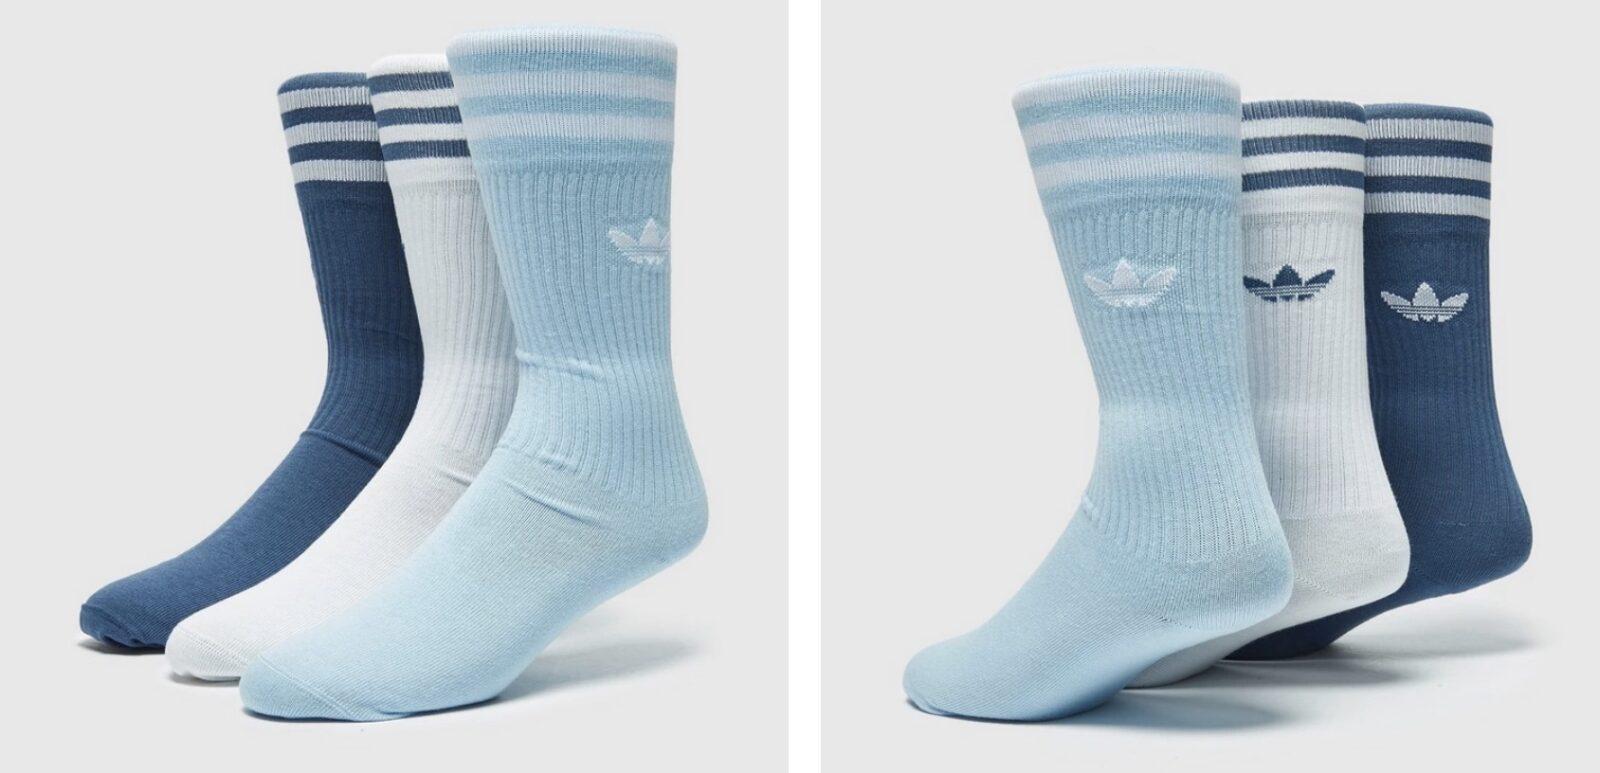 adidas originals 3-stripe socks